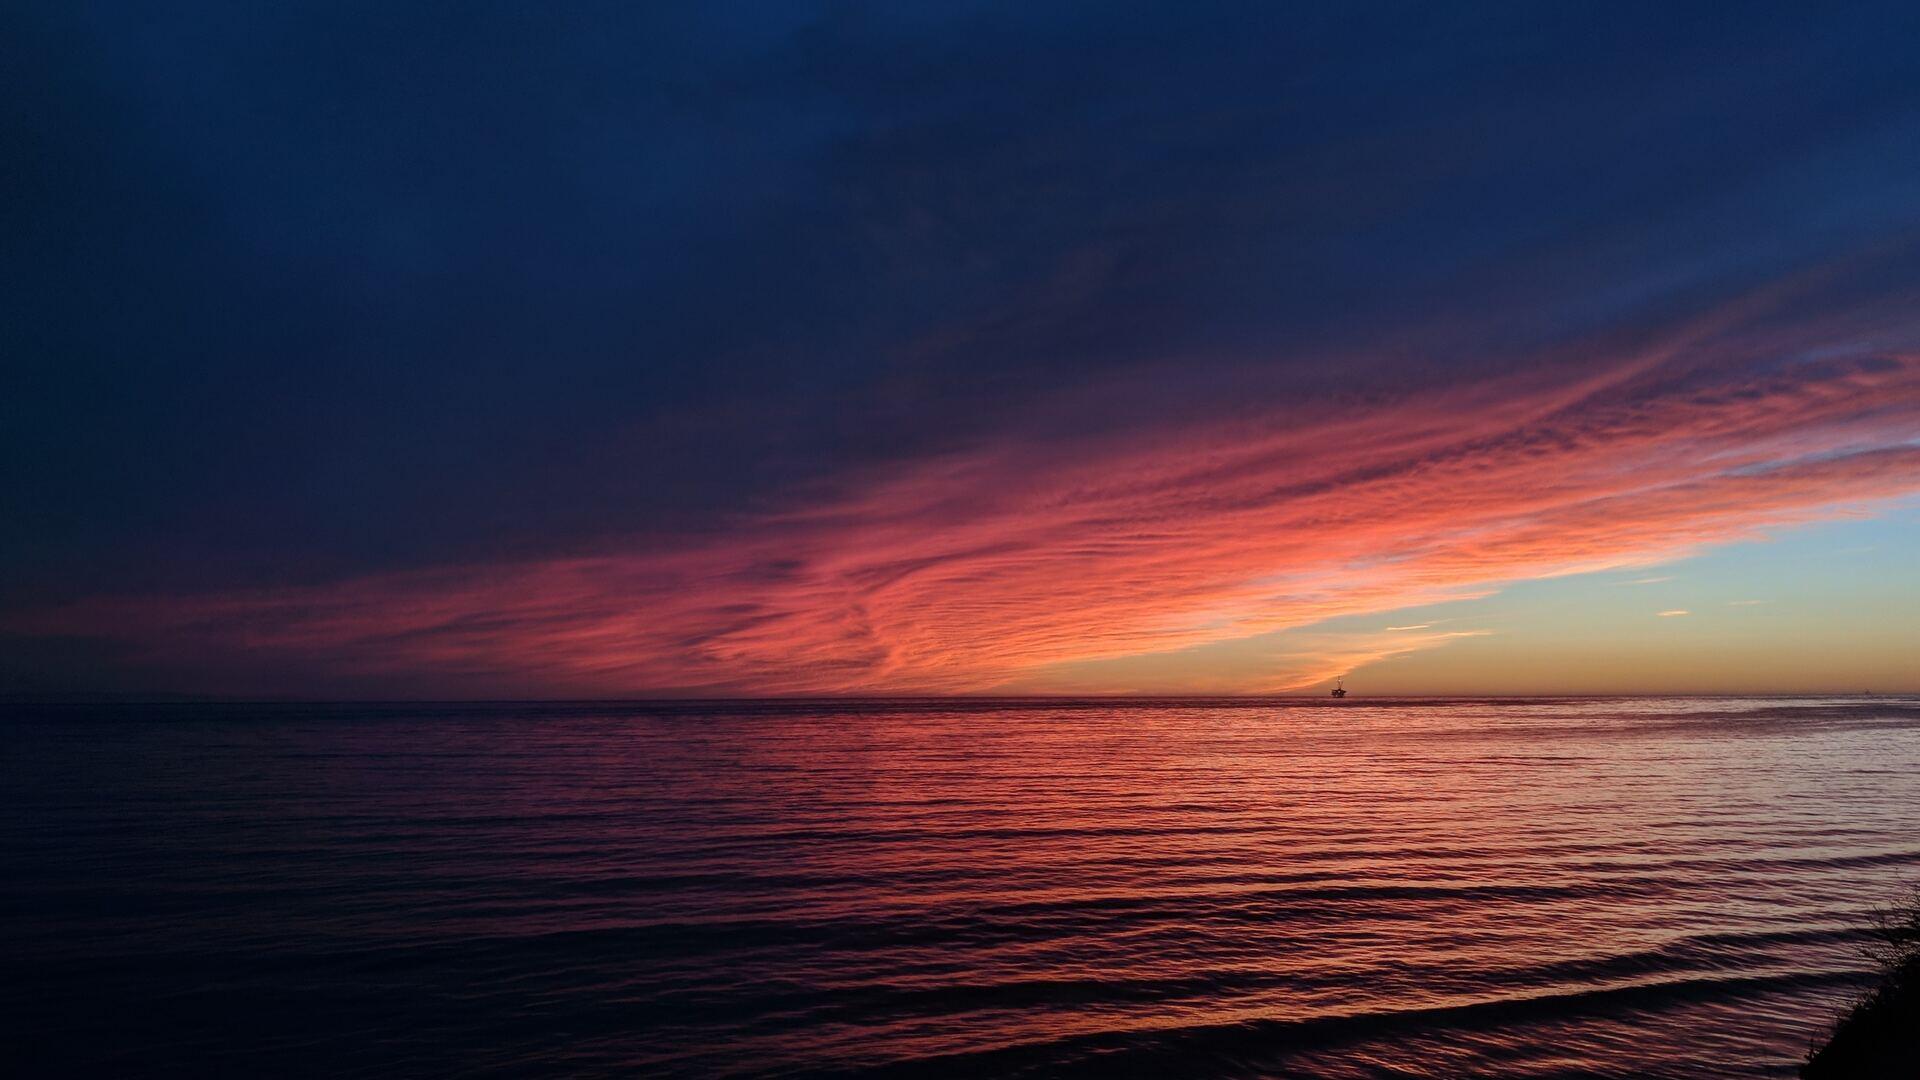 1920x1080 Sea Ocean Sunset Reflection Pastel Waves Laptop ...